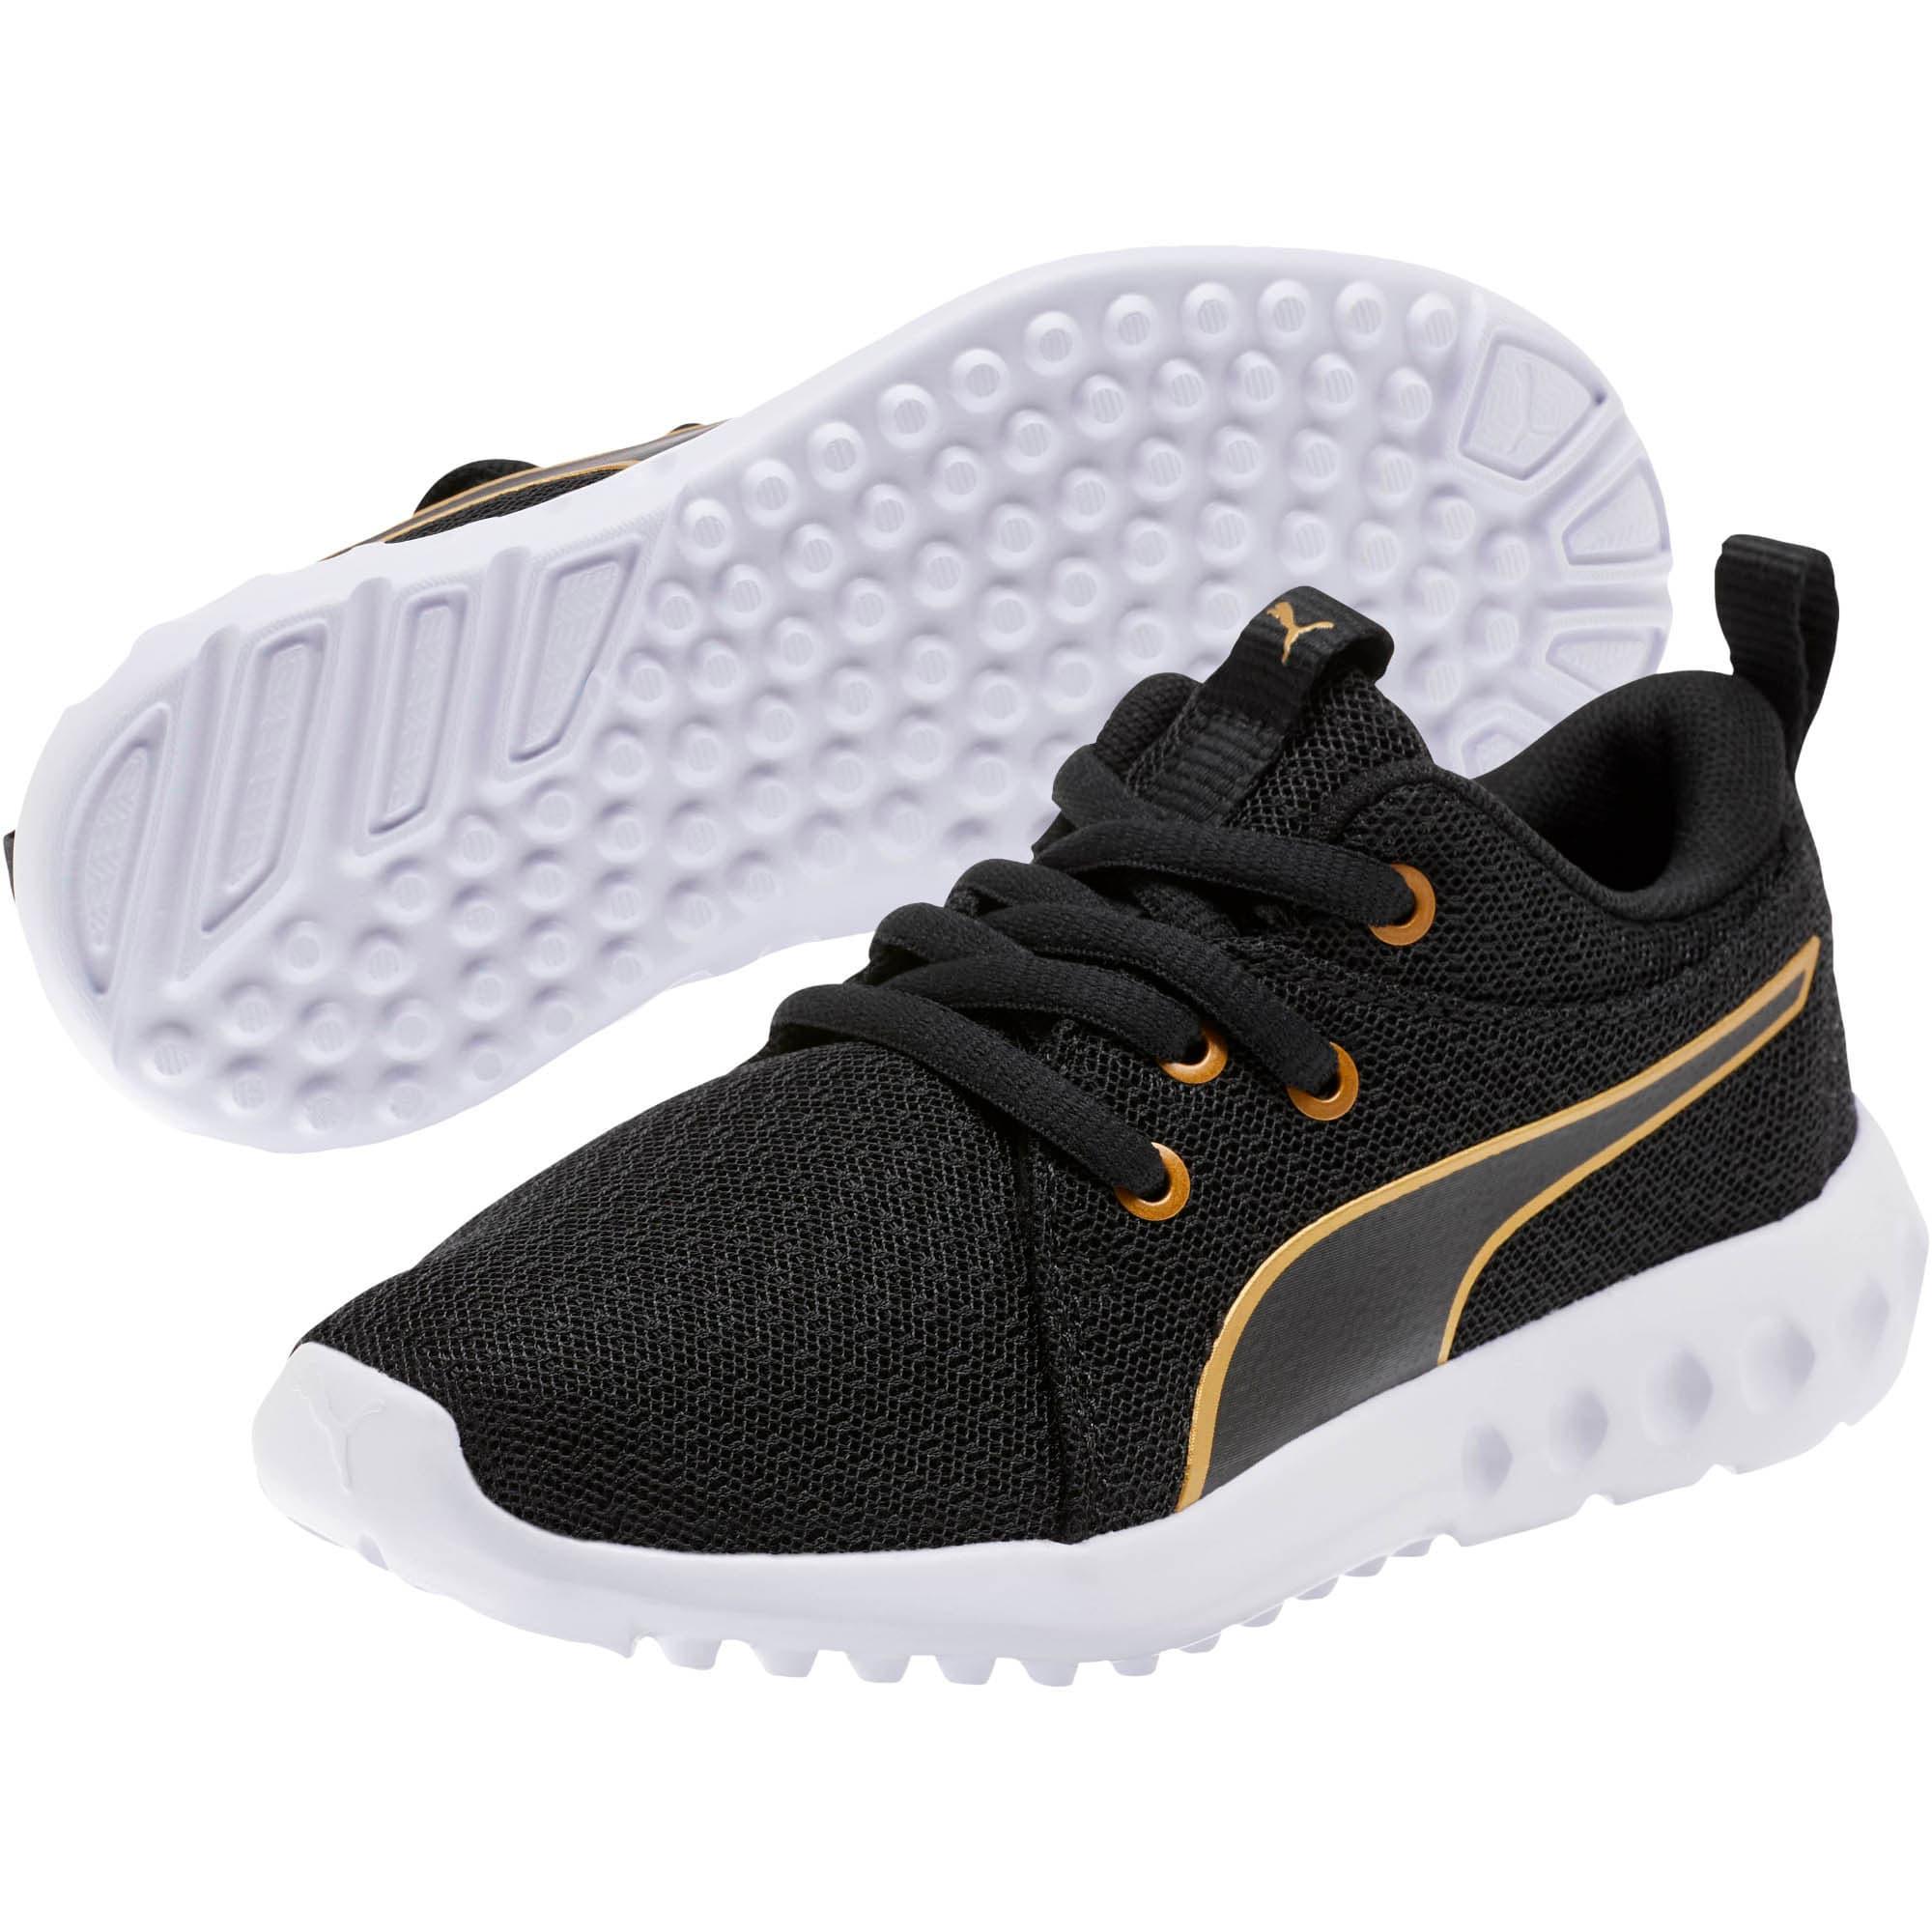 Thumbnail 2 of Carson 2 Metallic Mesh Little Kids' Shoes, Puma Black-Gold, medium